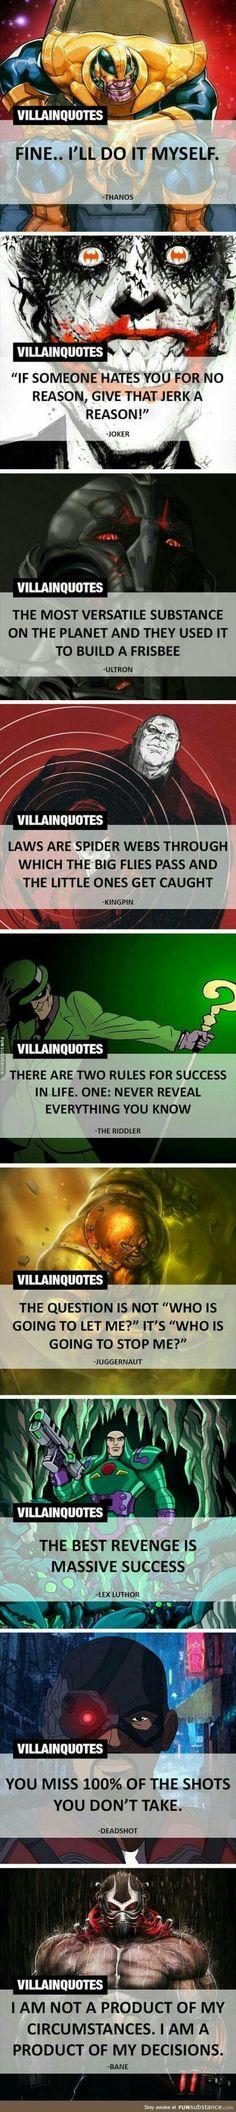 Villainquotes